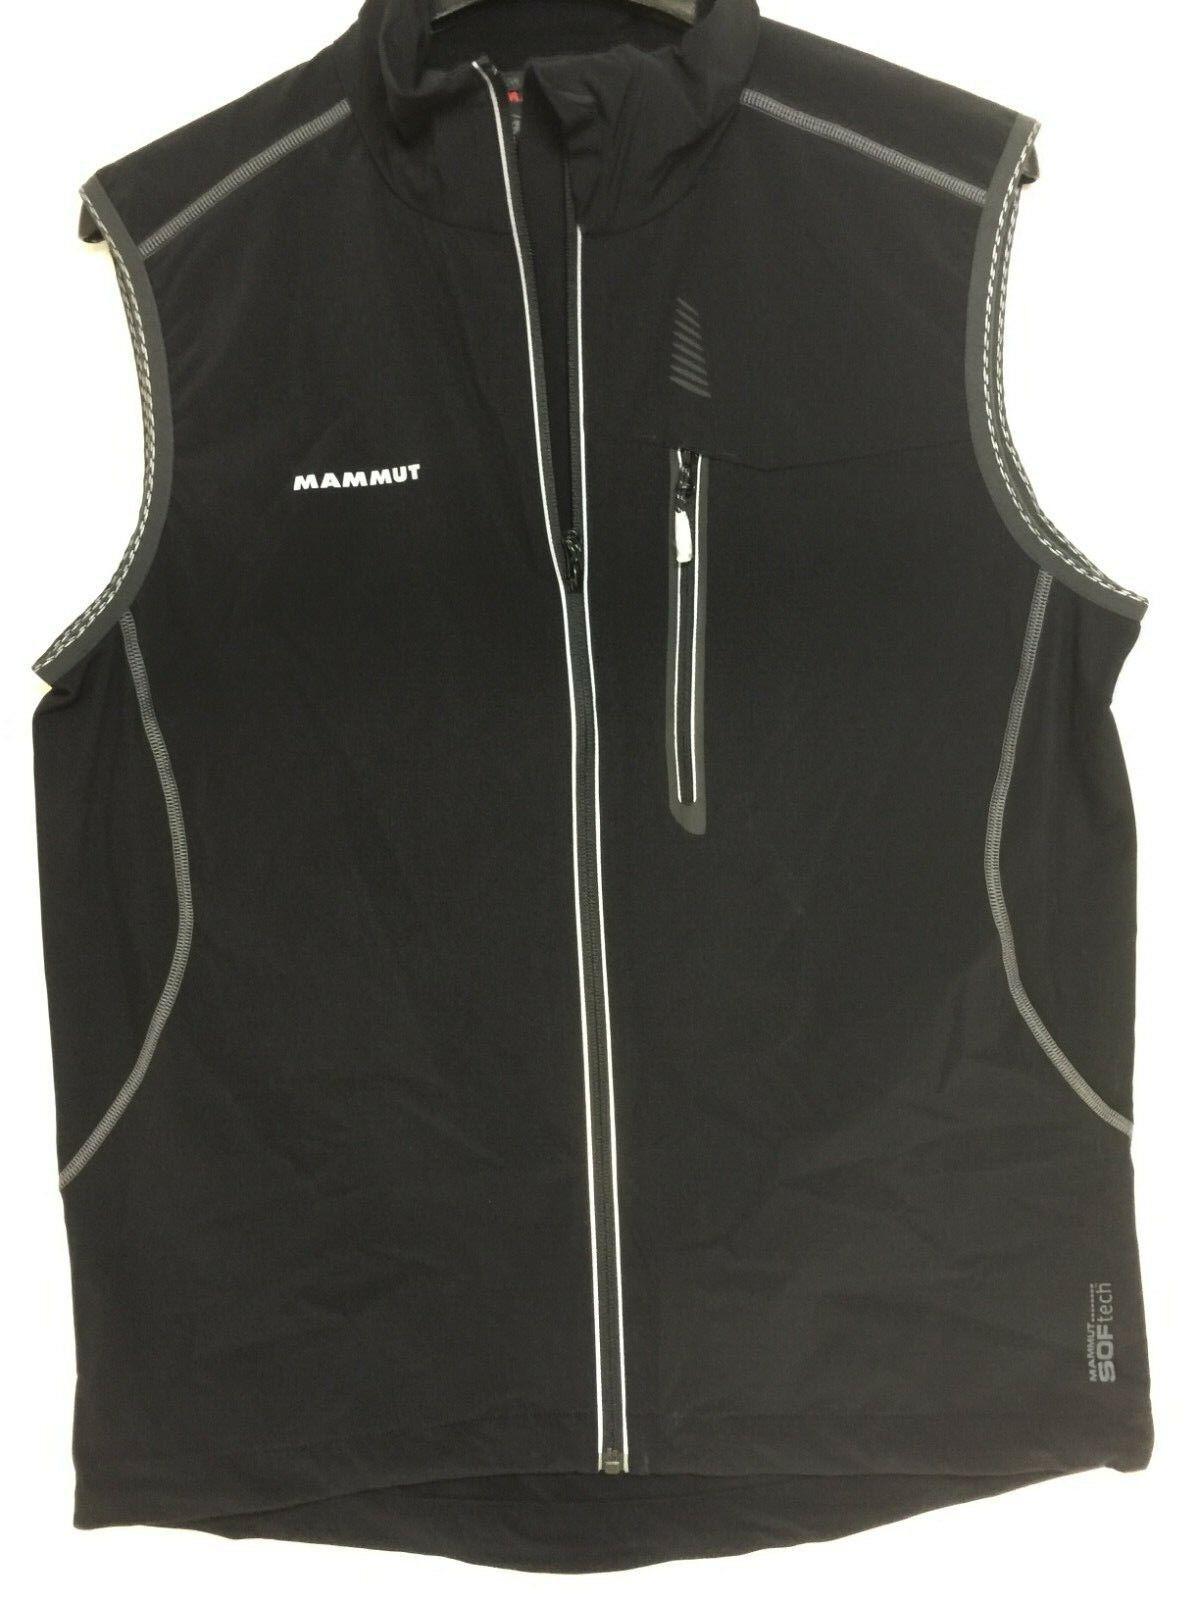 Mammut Aenergy Vest - Men's New Softech NEW NWT Size L Large